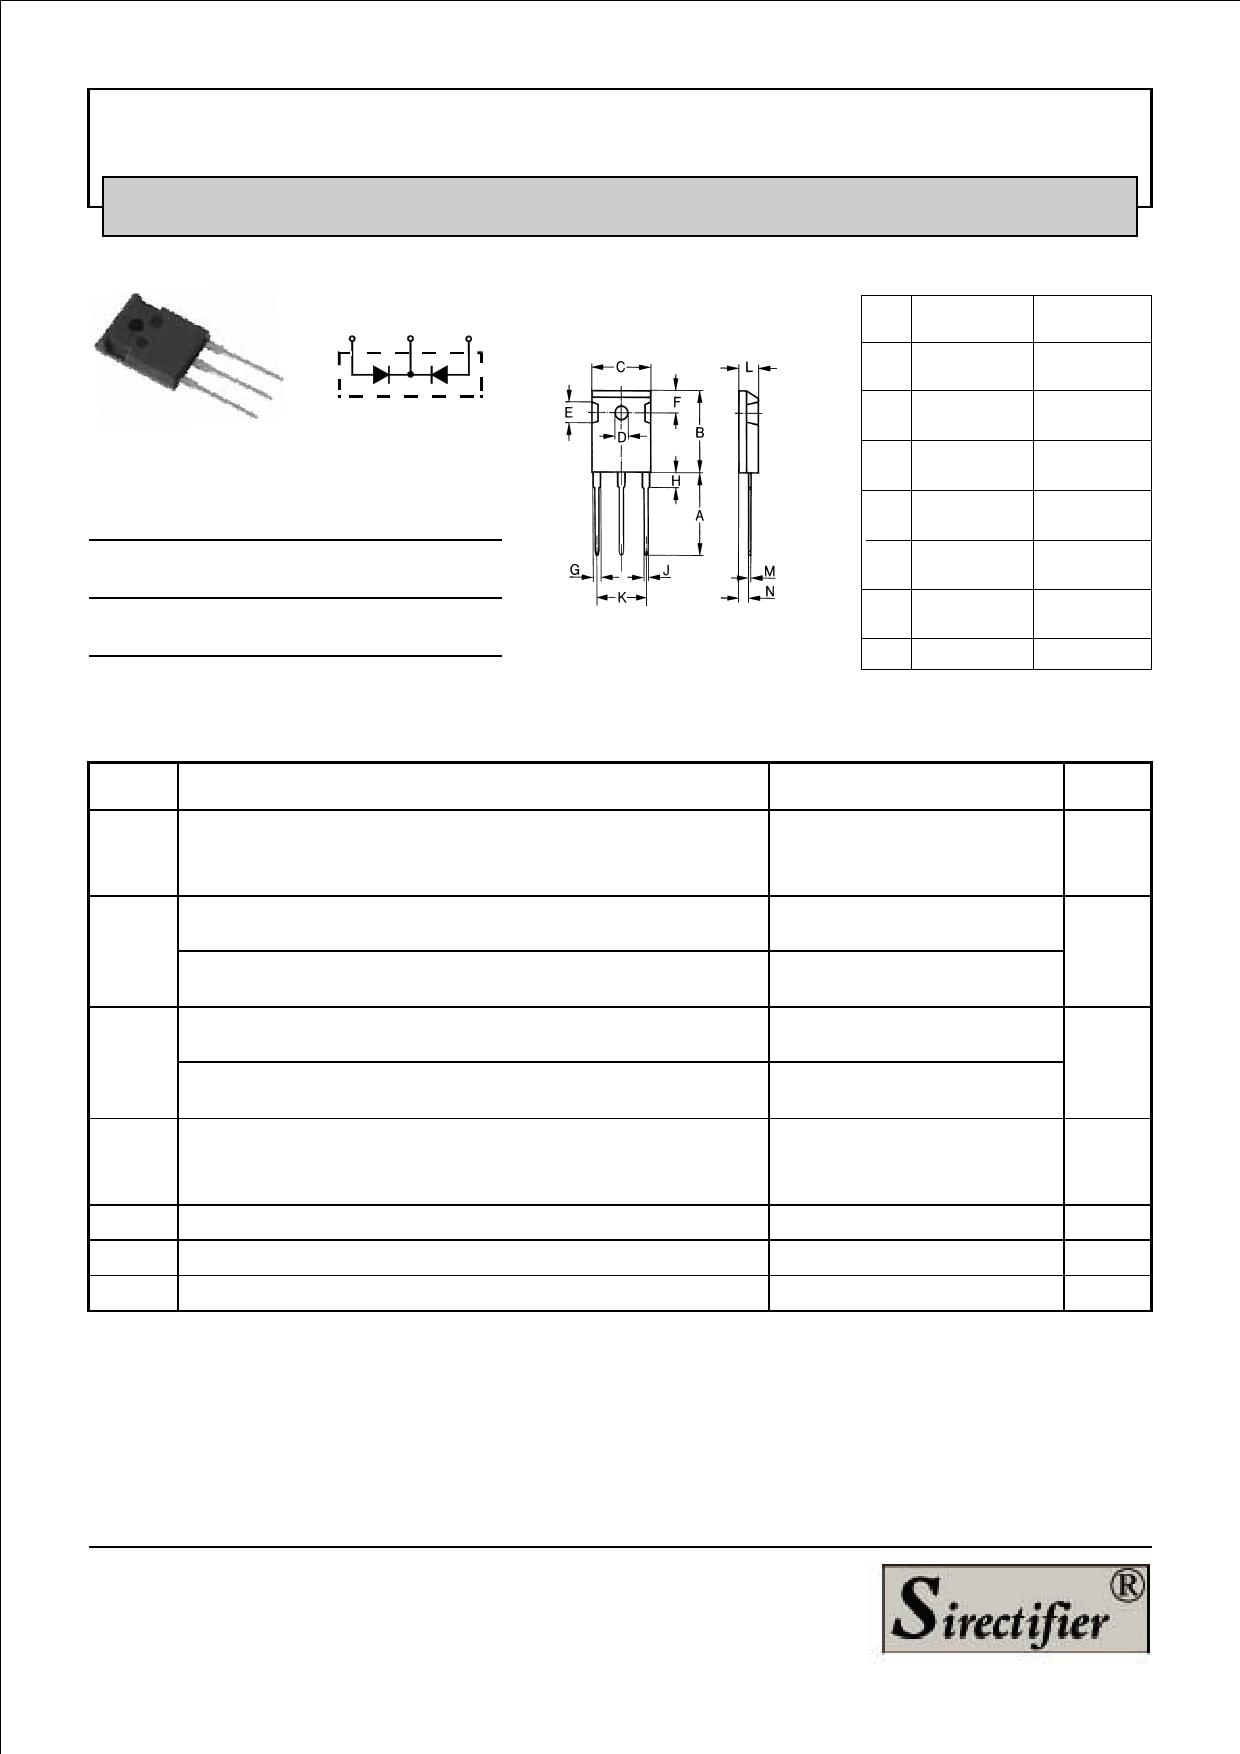 MUR6020PT datasheet